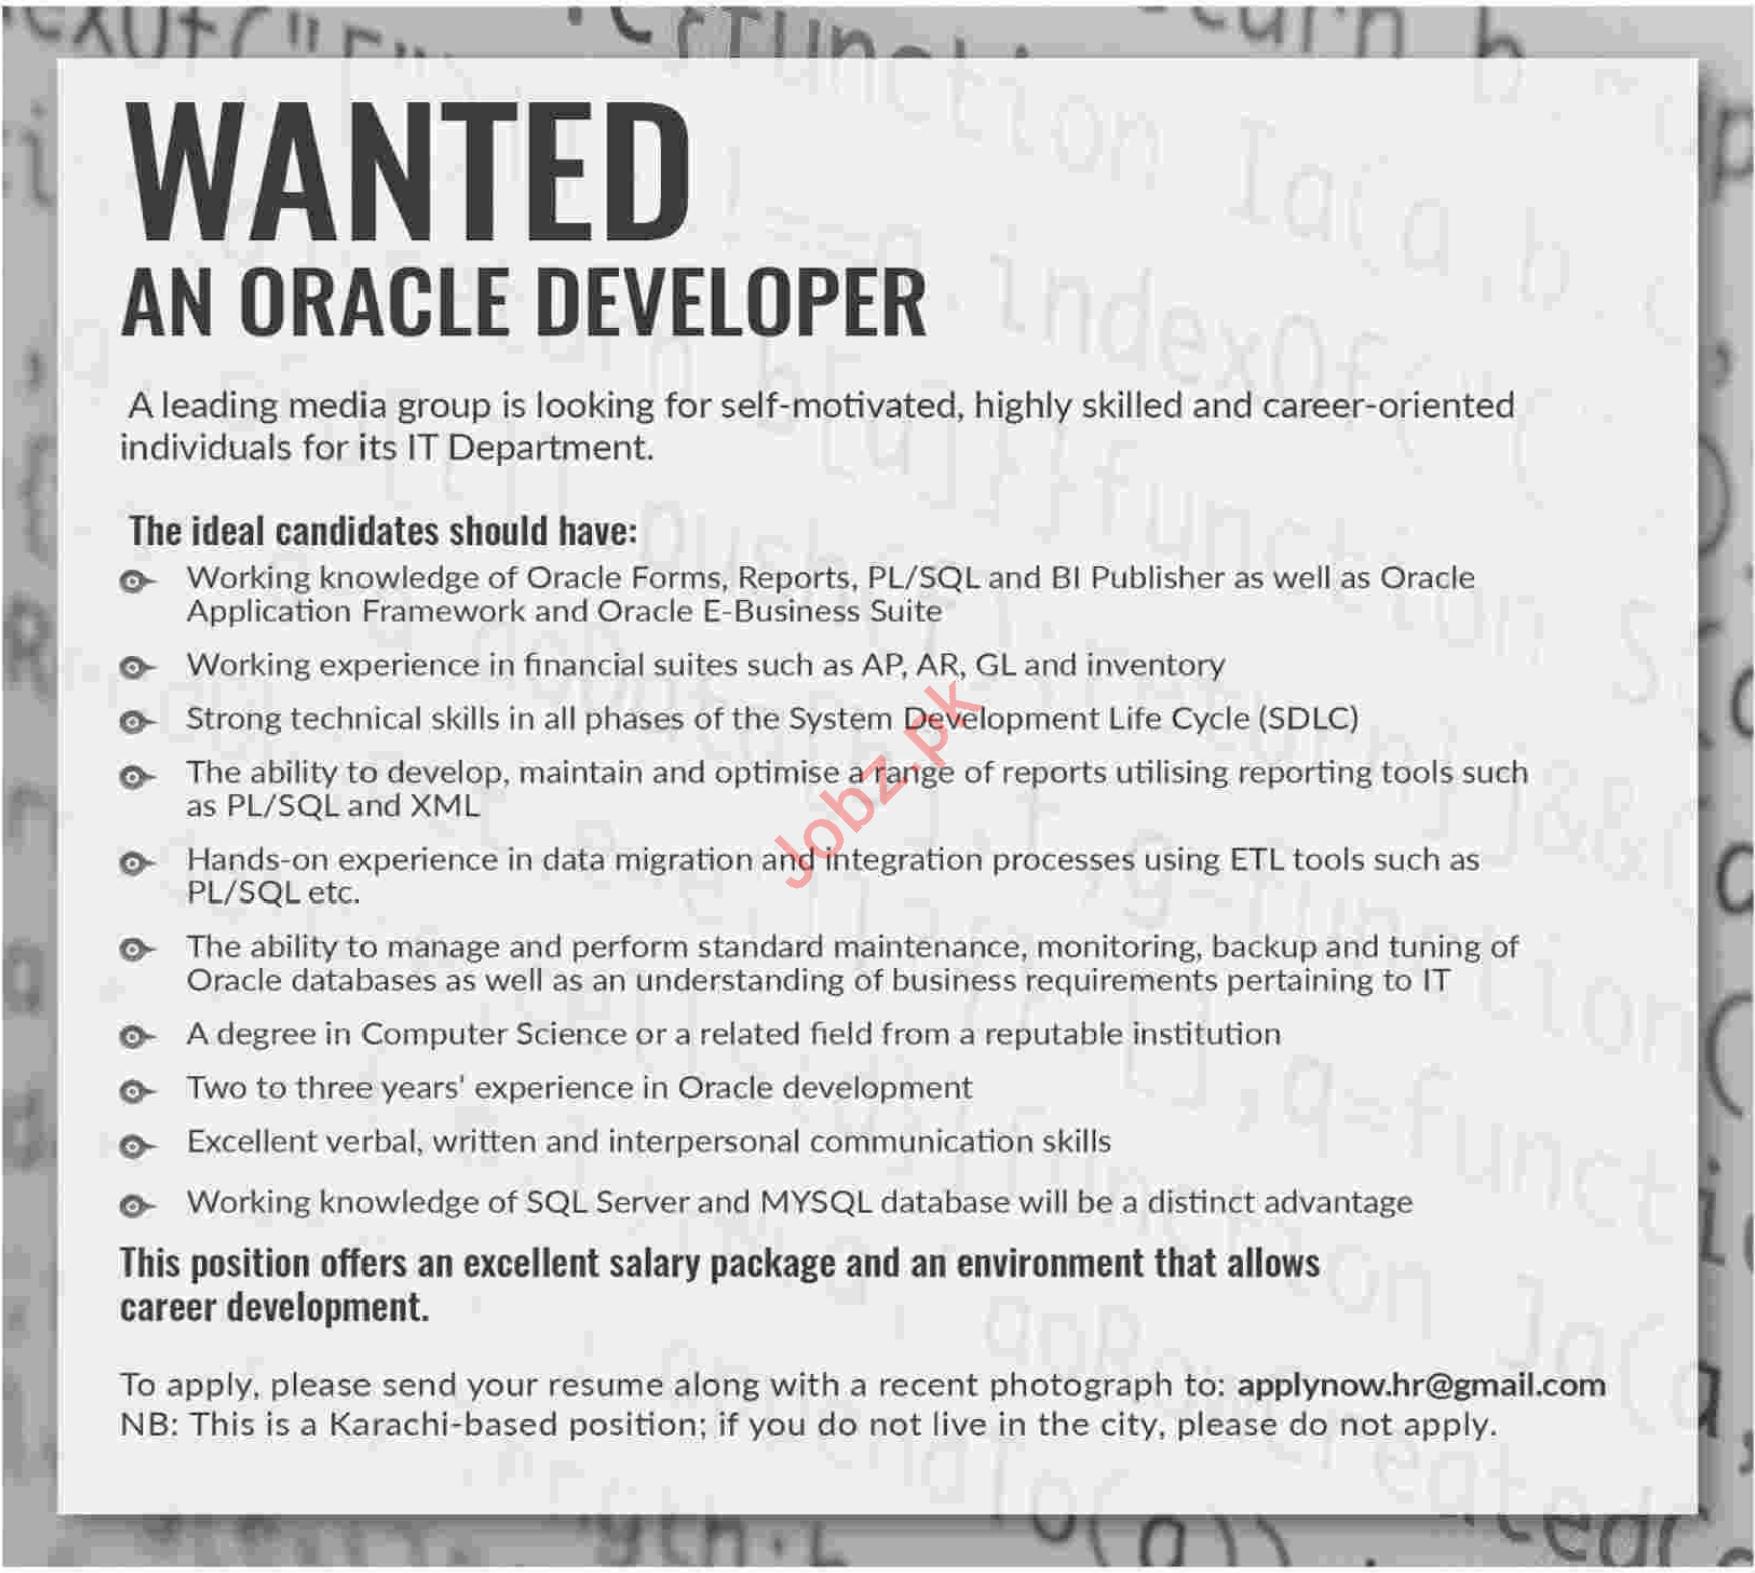 Oracle Developer Jobs at Media Group